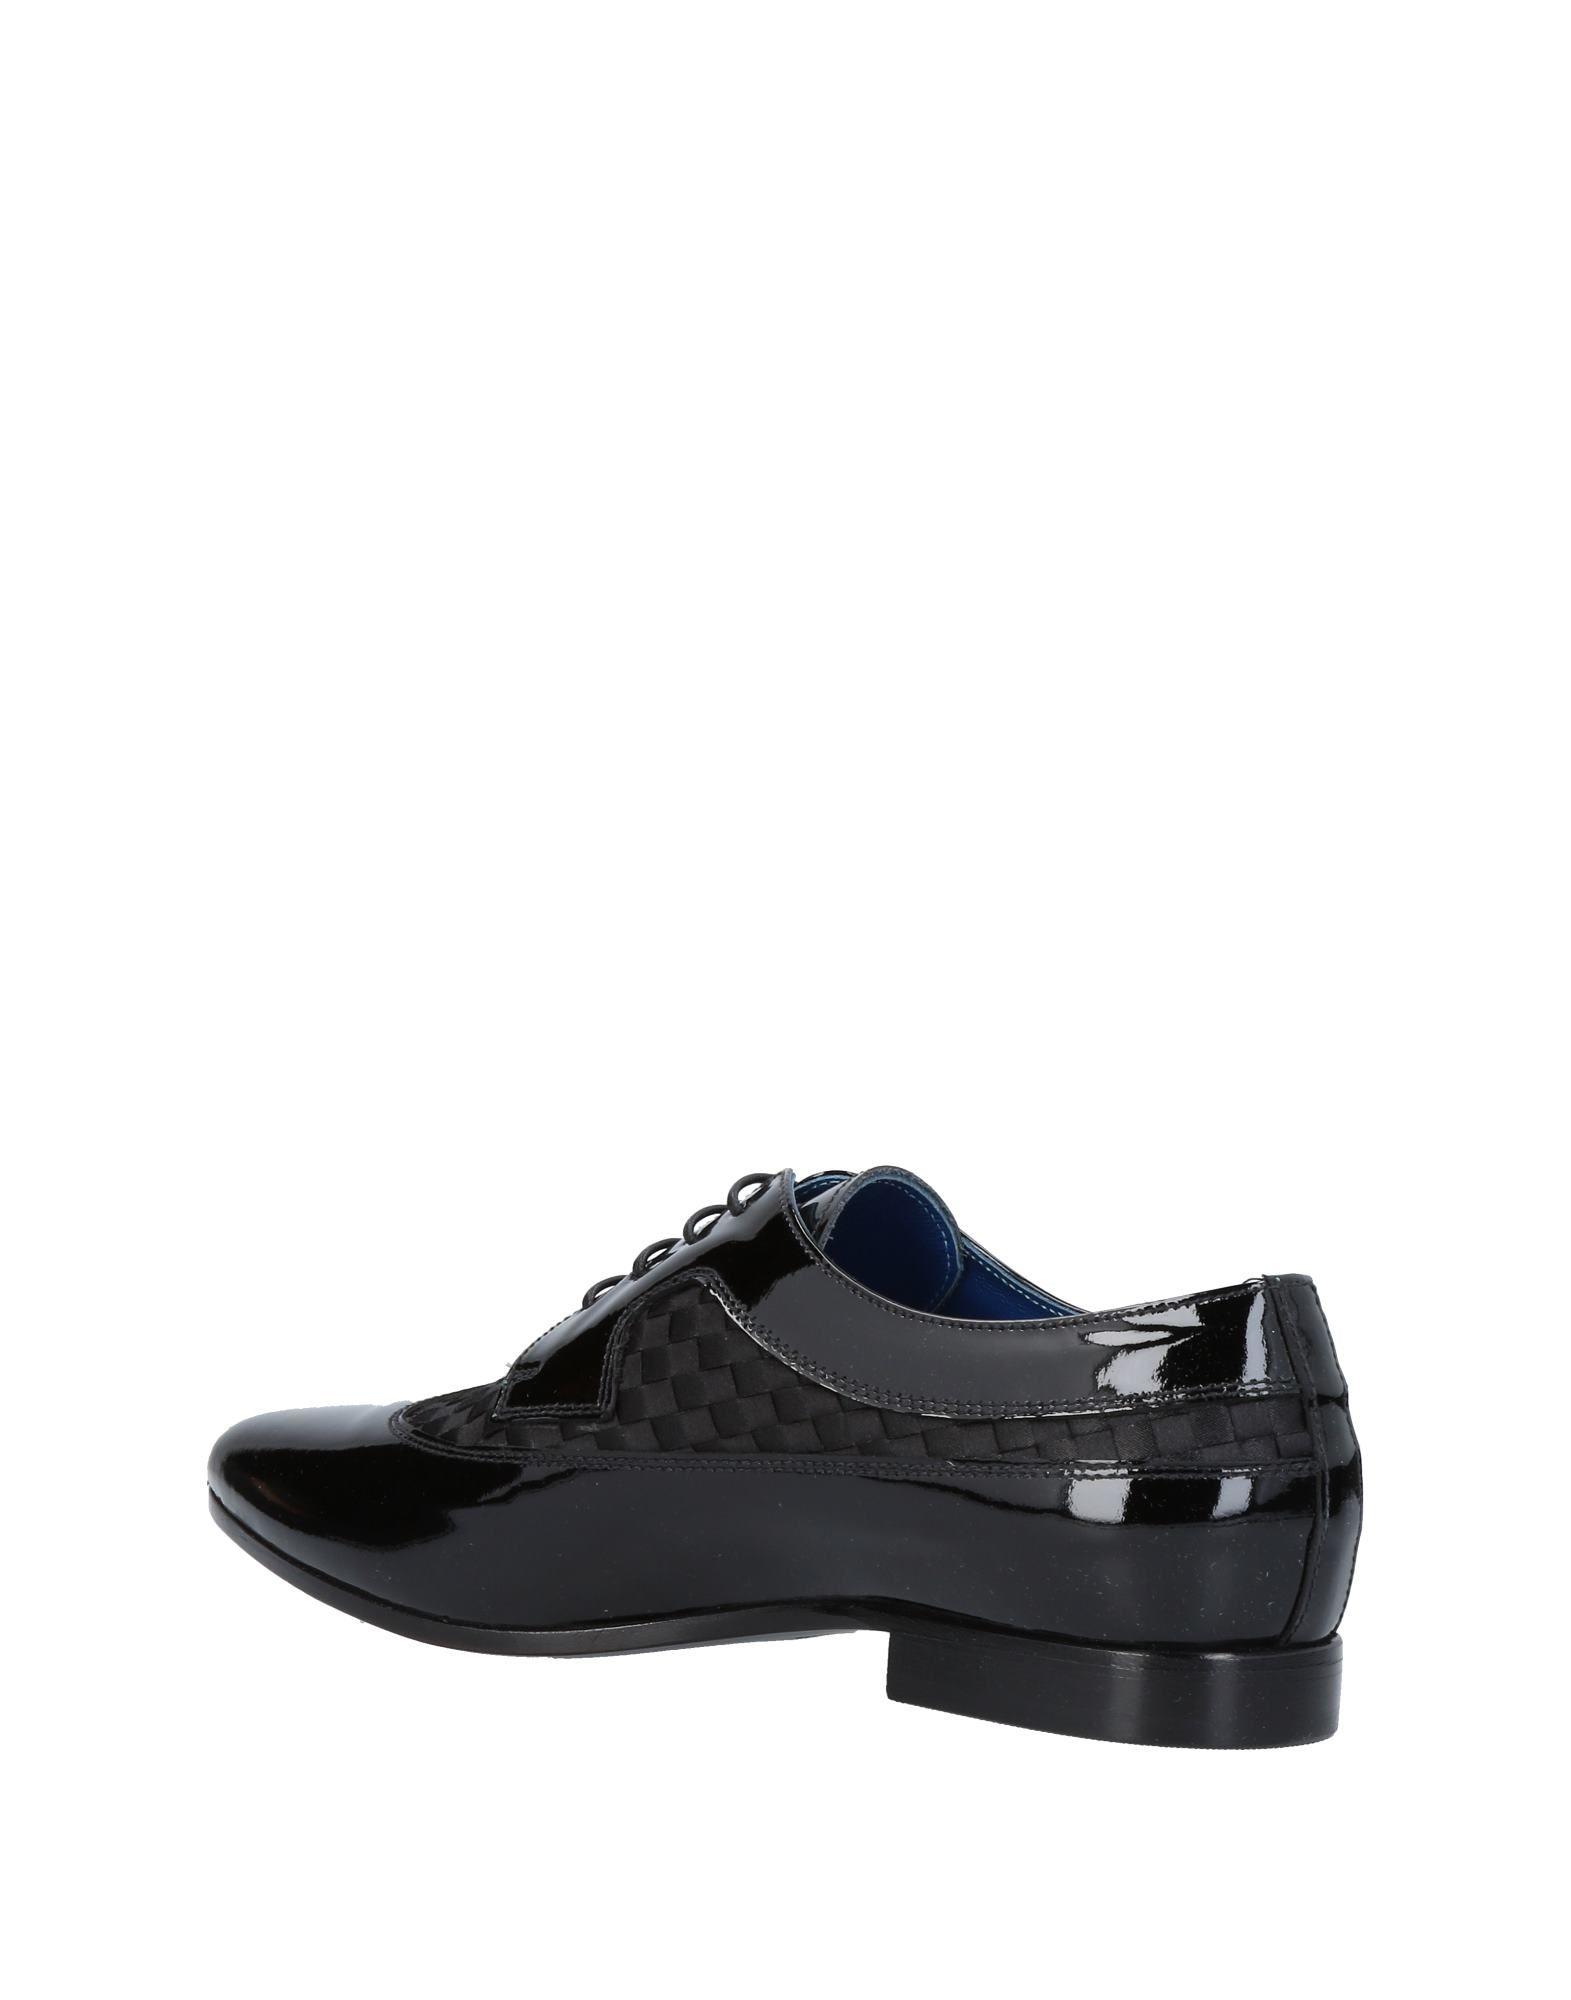 Chaussures À Lacets Giovanni Conti Femme - Chaussures À Lacets Giovanni Conti sur